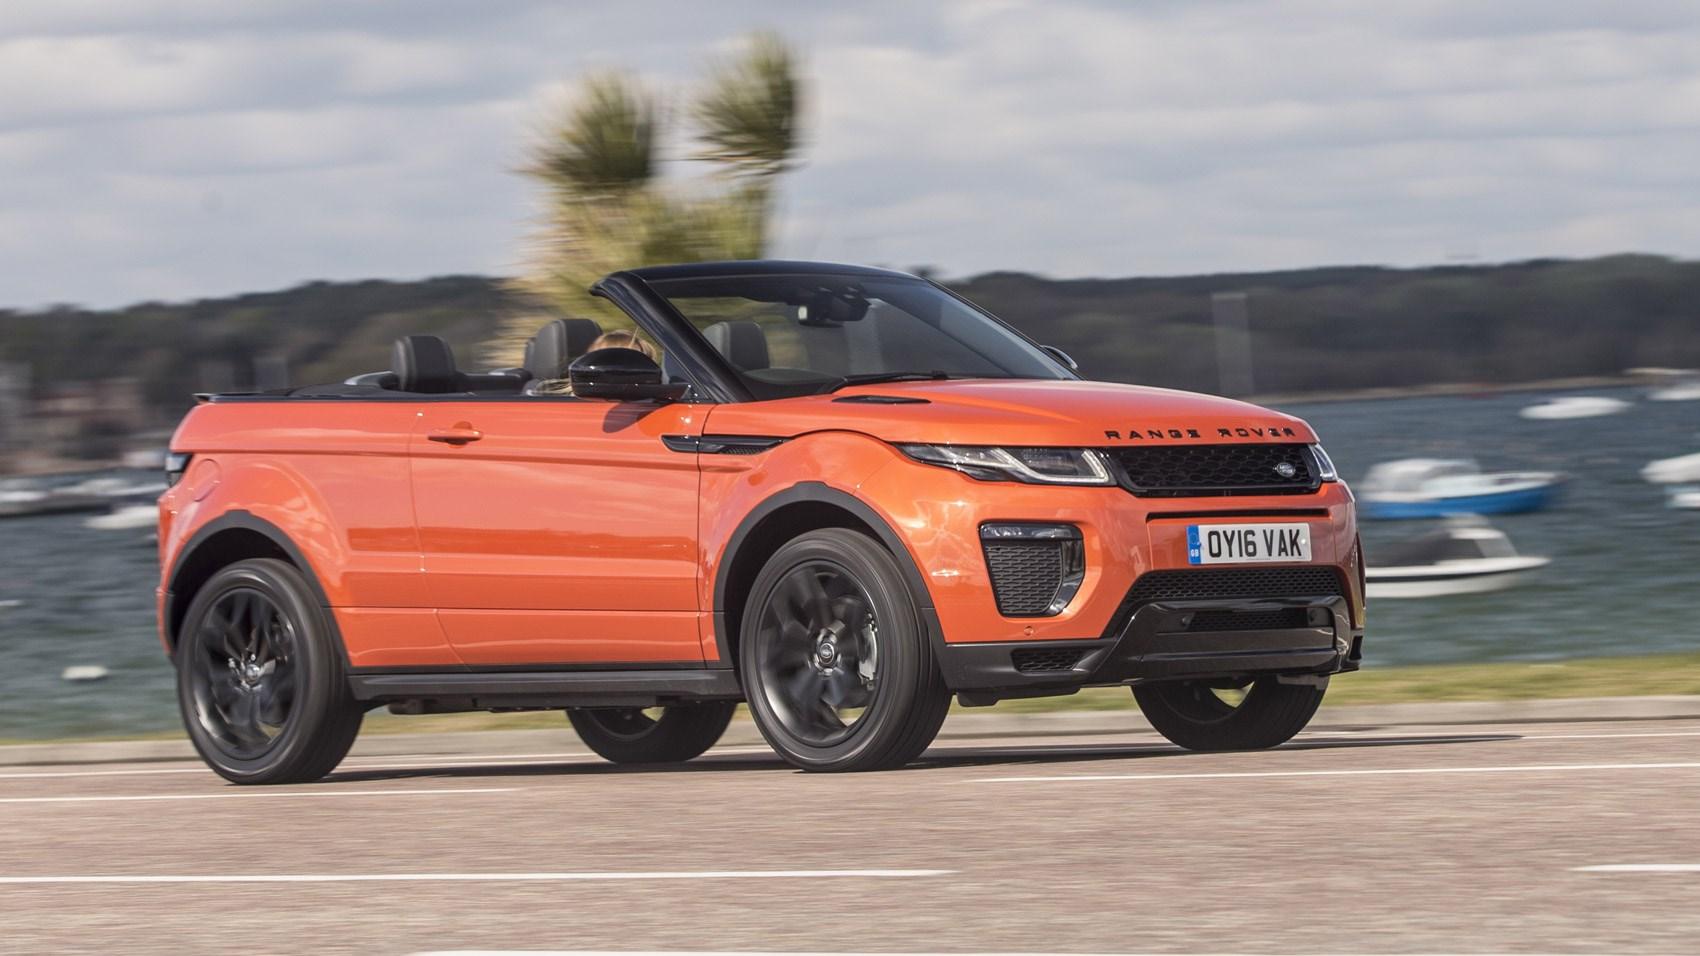 range rover evoque convertible 2 0 td4 hse dynamic 2016 uk review car magazine. Black Bedroom Furniture Sets. Home Design Ideas